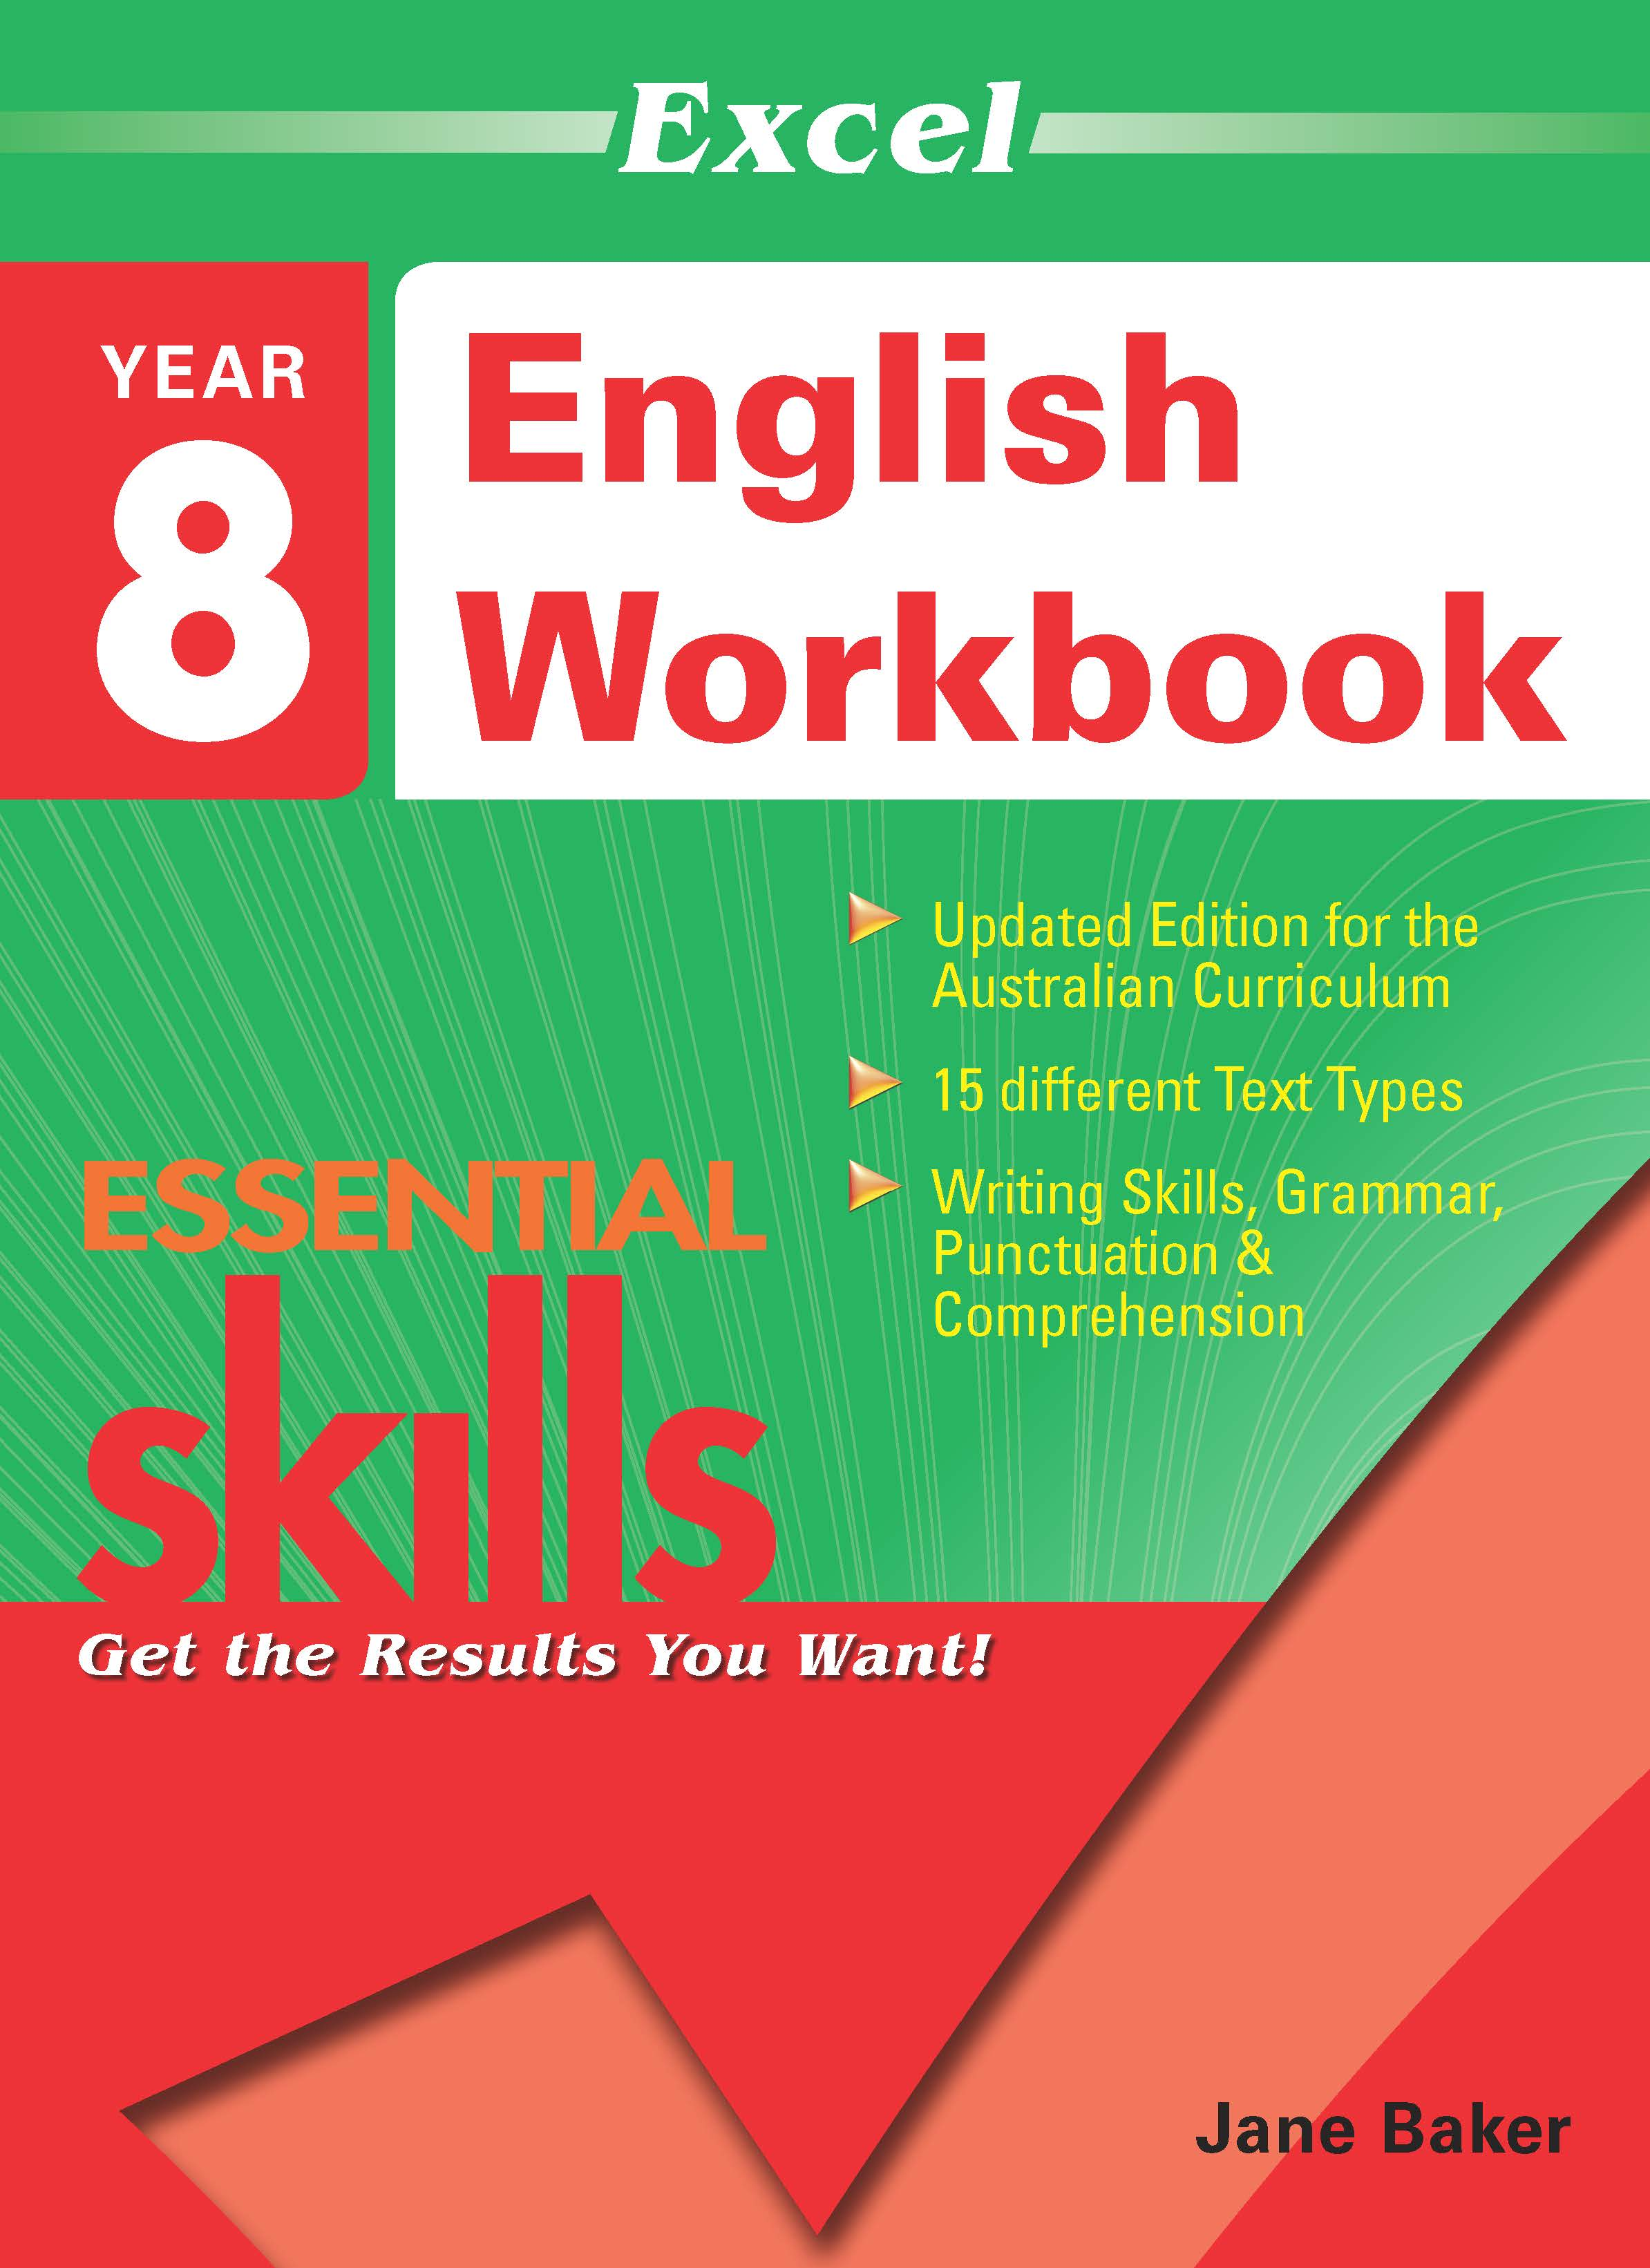 Excel Essential Skills: English Workbook Year 8